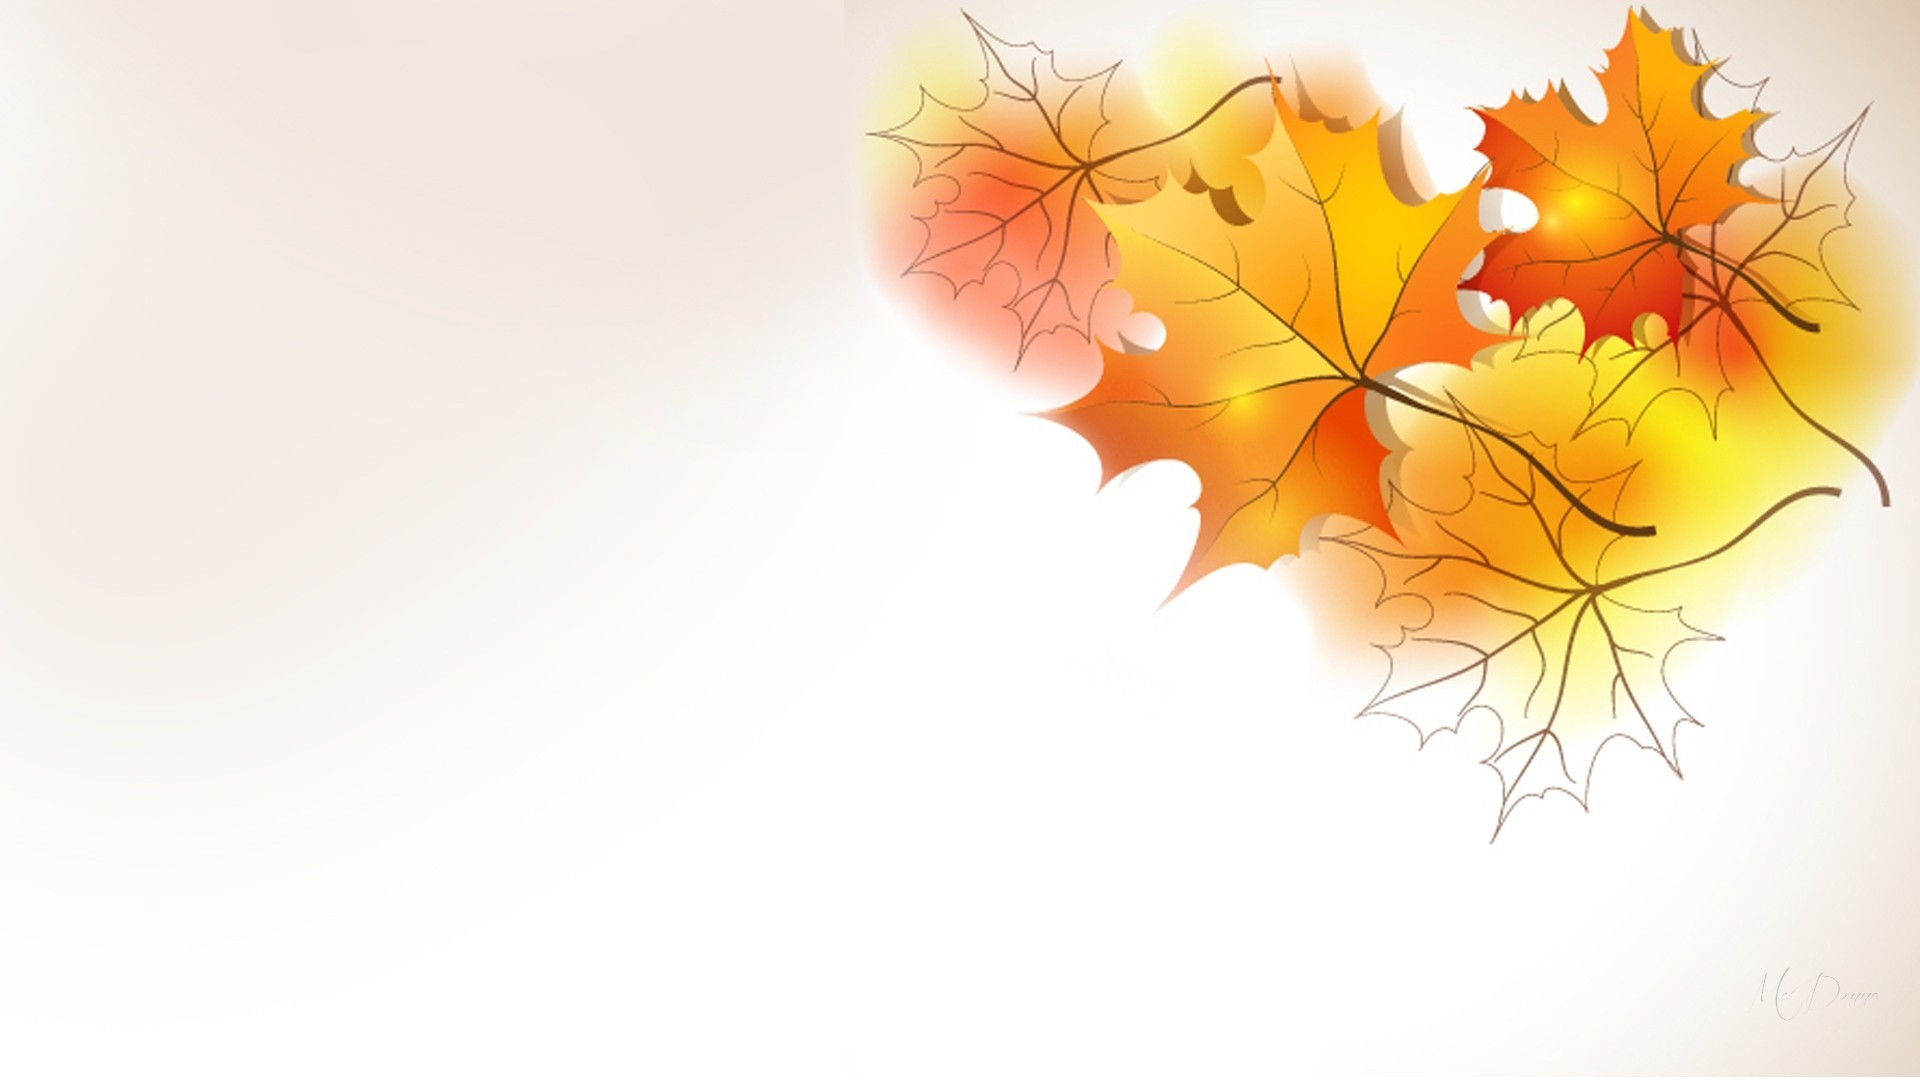 Fall Leaves Desktop Wallpaper Backgrounds Firefox Wallpaper Themes 183 ① Wallpapertag